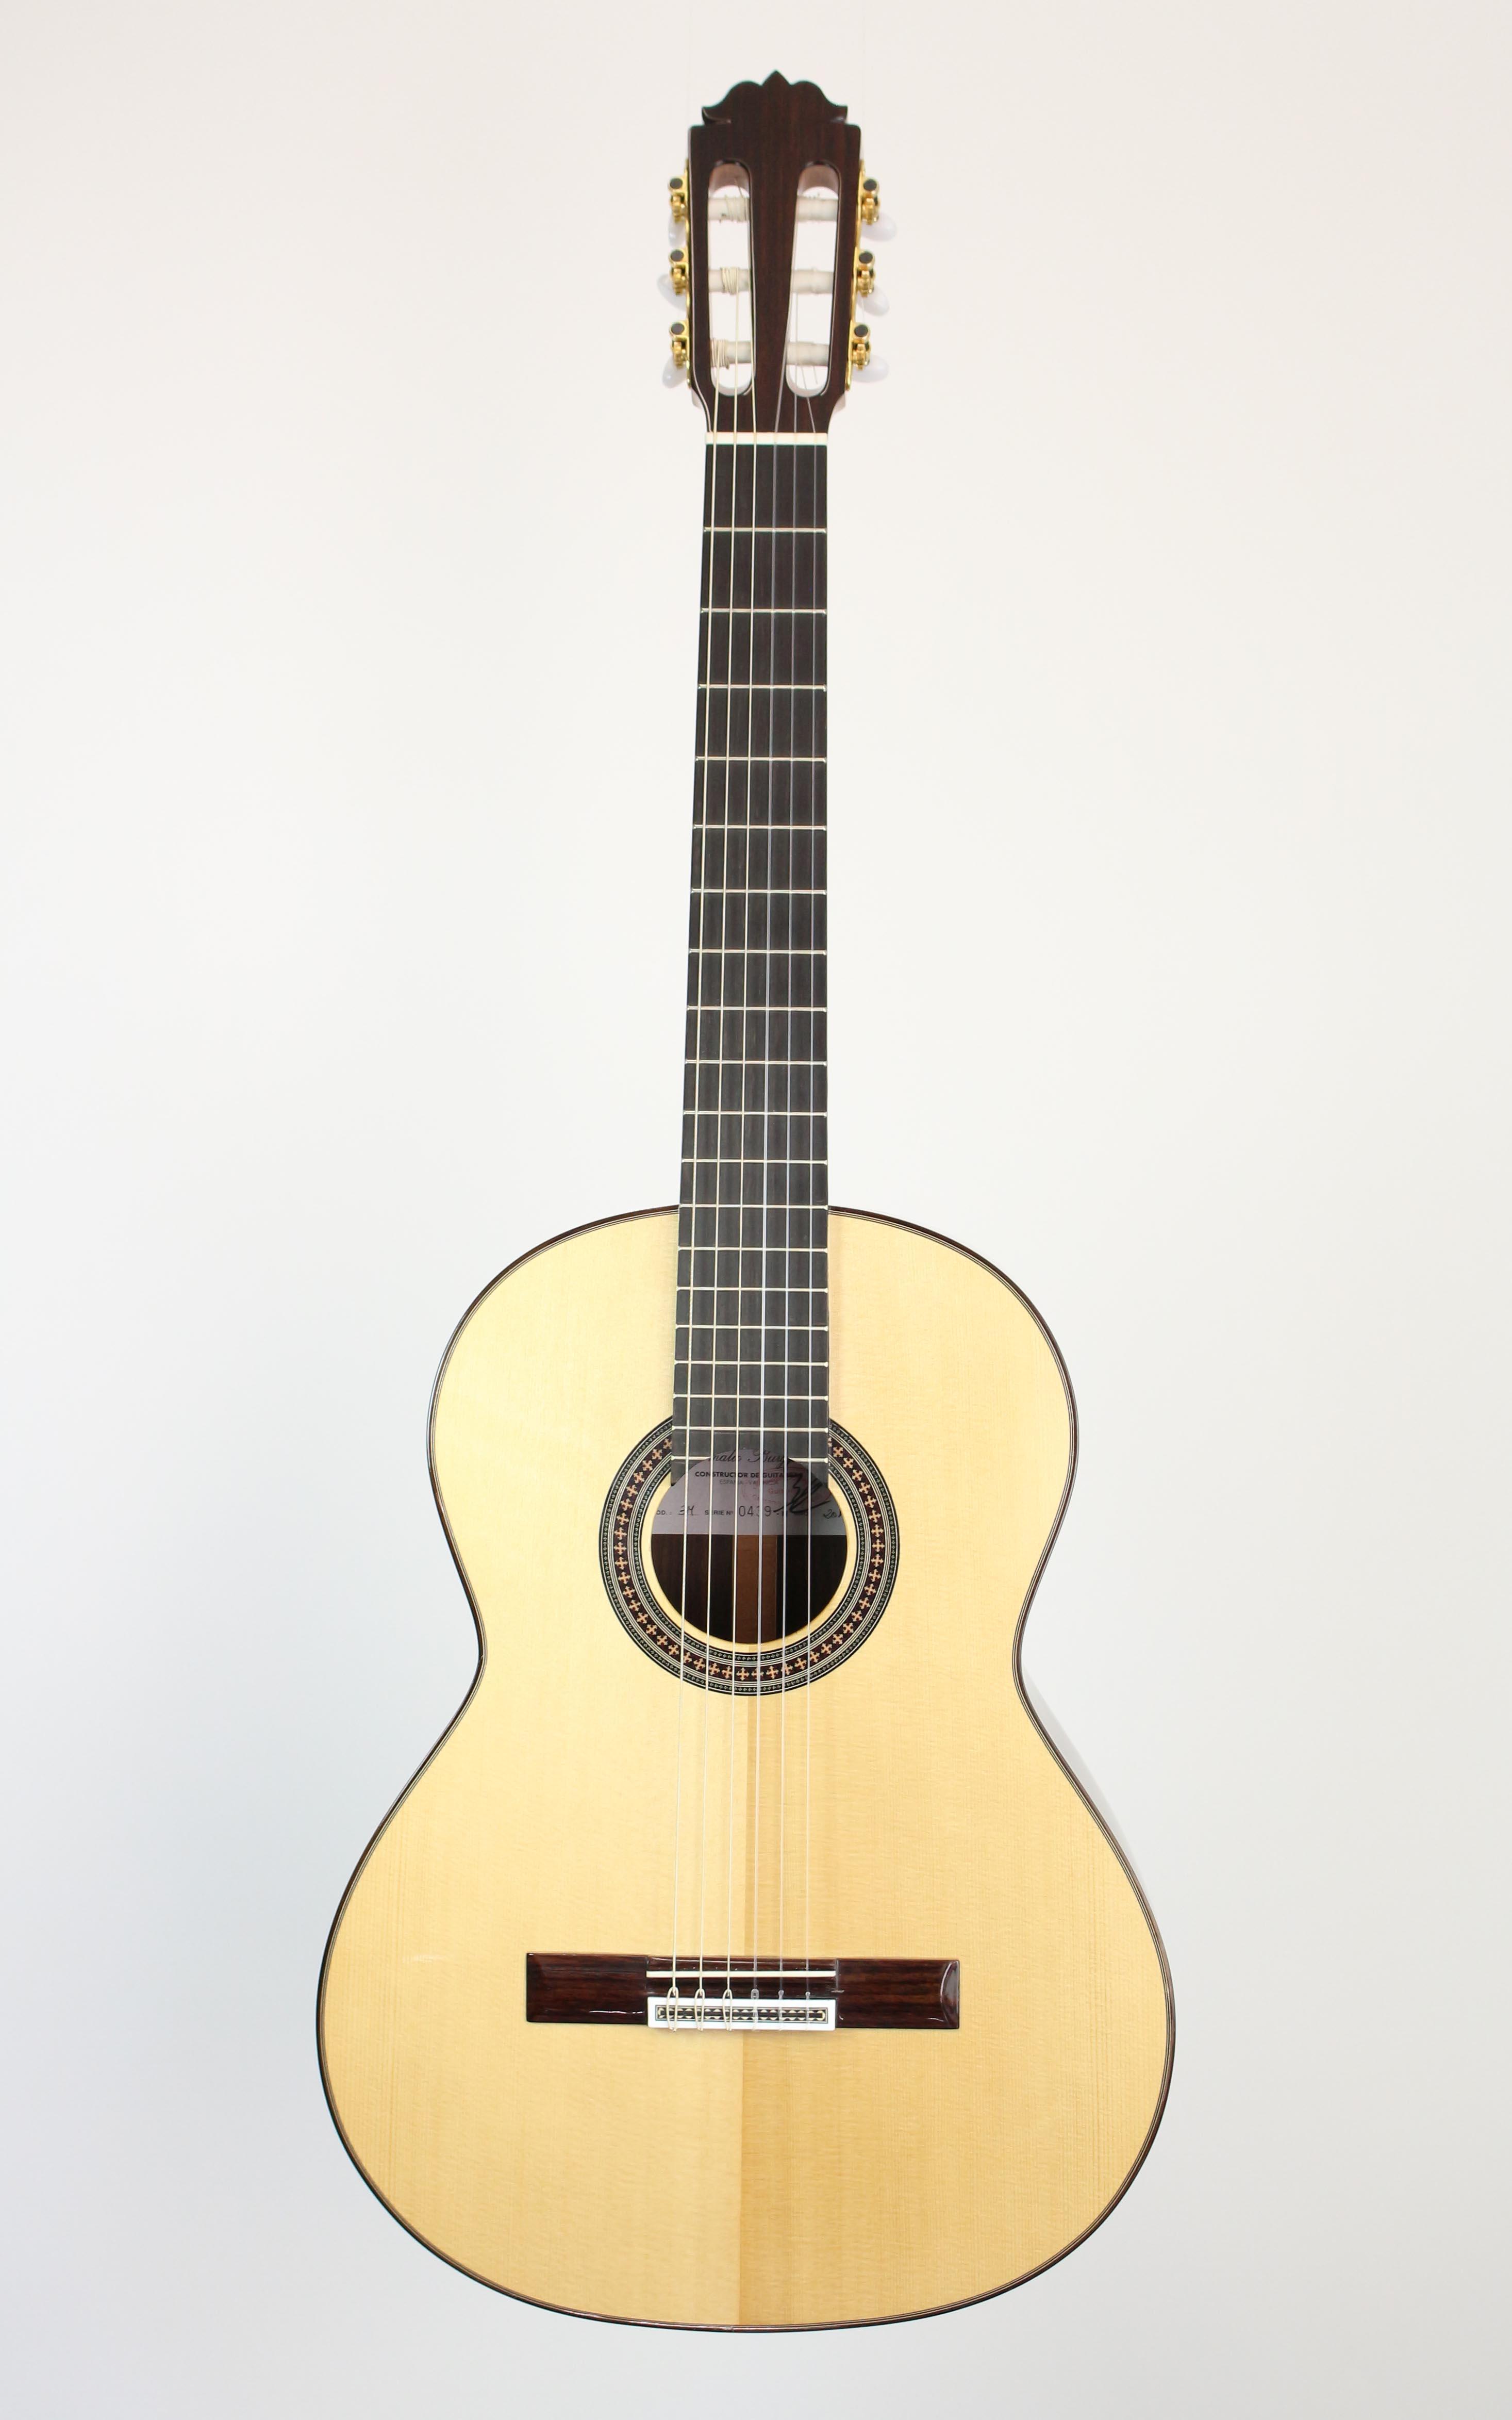 Amalio Burguet - 3M Fichte - Gitarren - Konzertgitarren | MUSIK BERTRAM Deutschland Freiburg